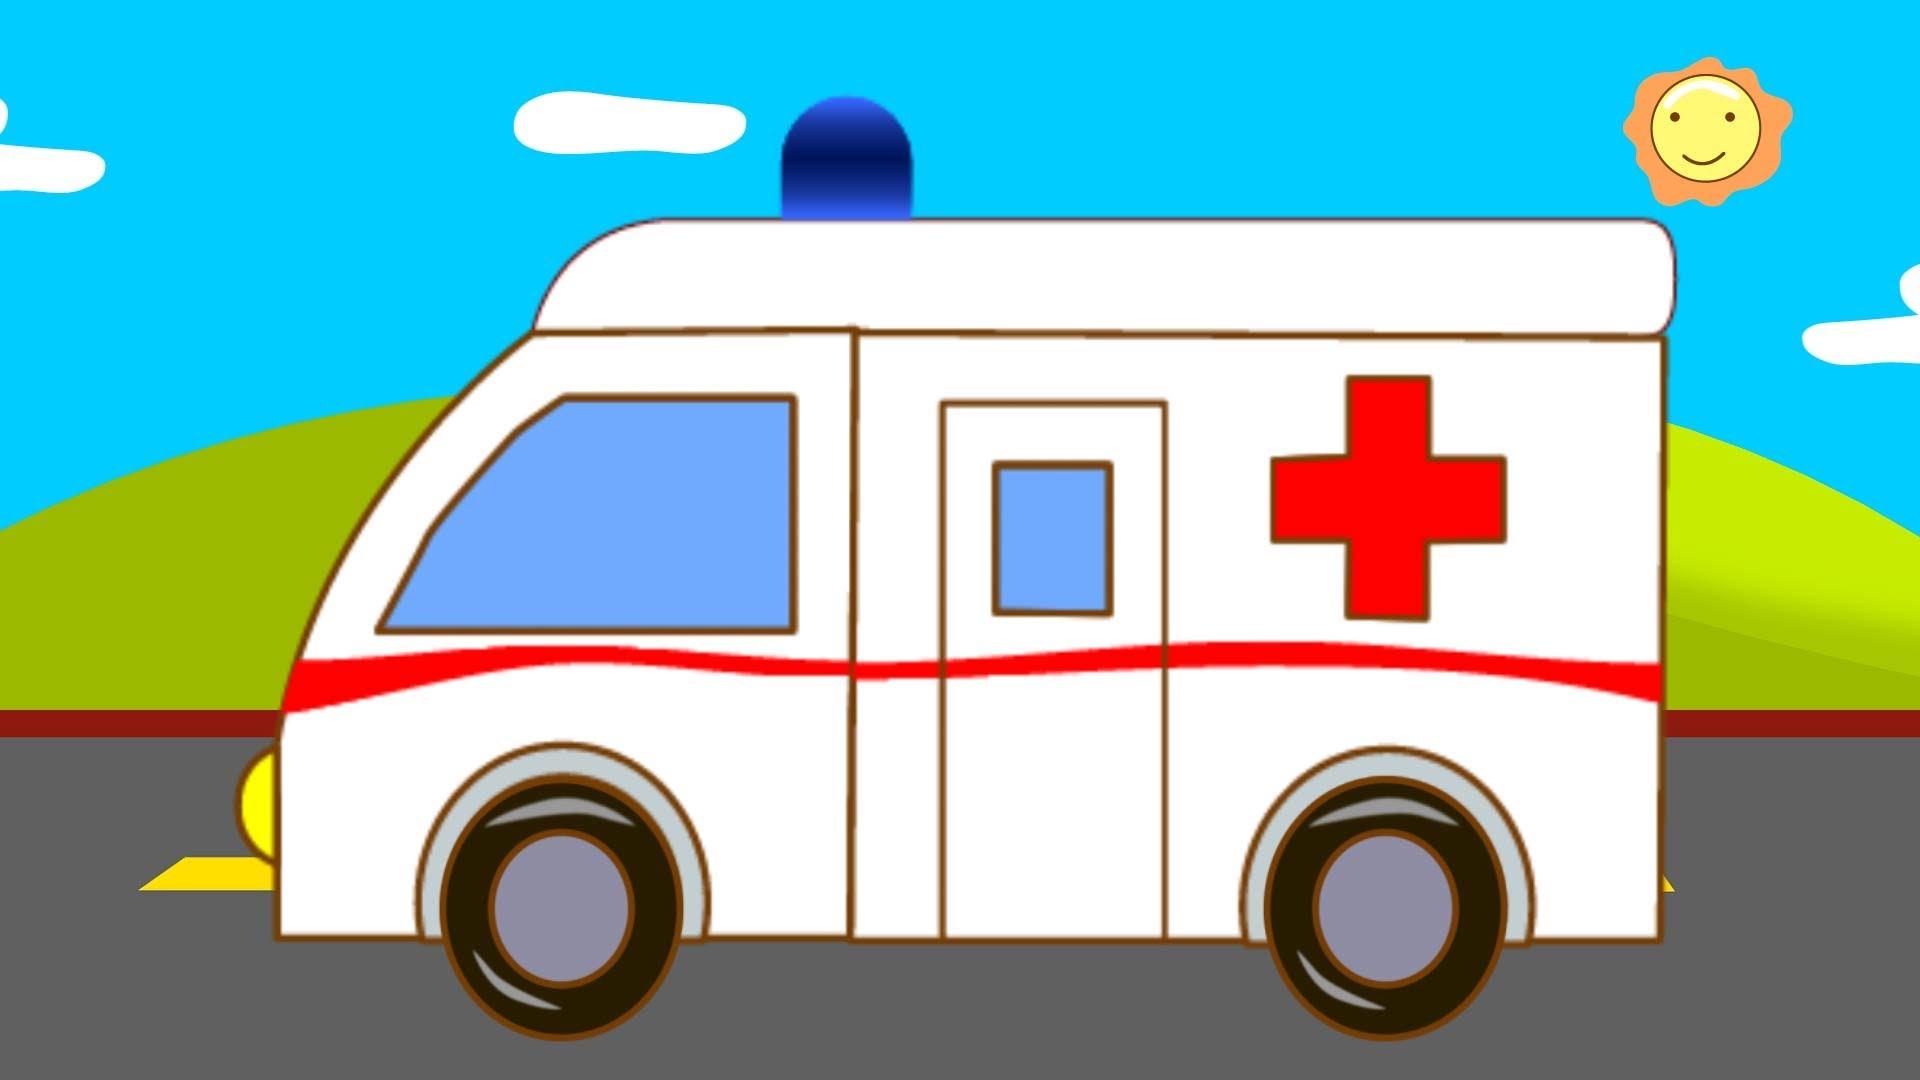 Ambulance clipart kid. Kids channel youtube